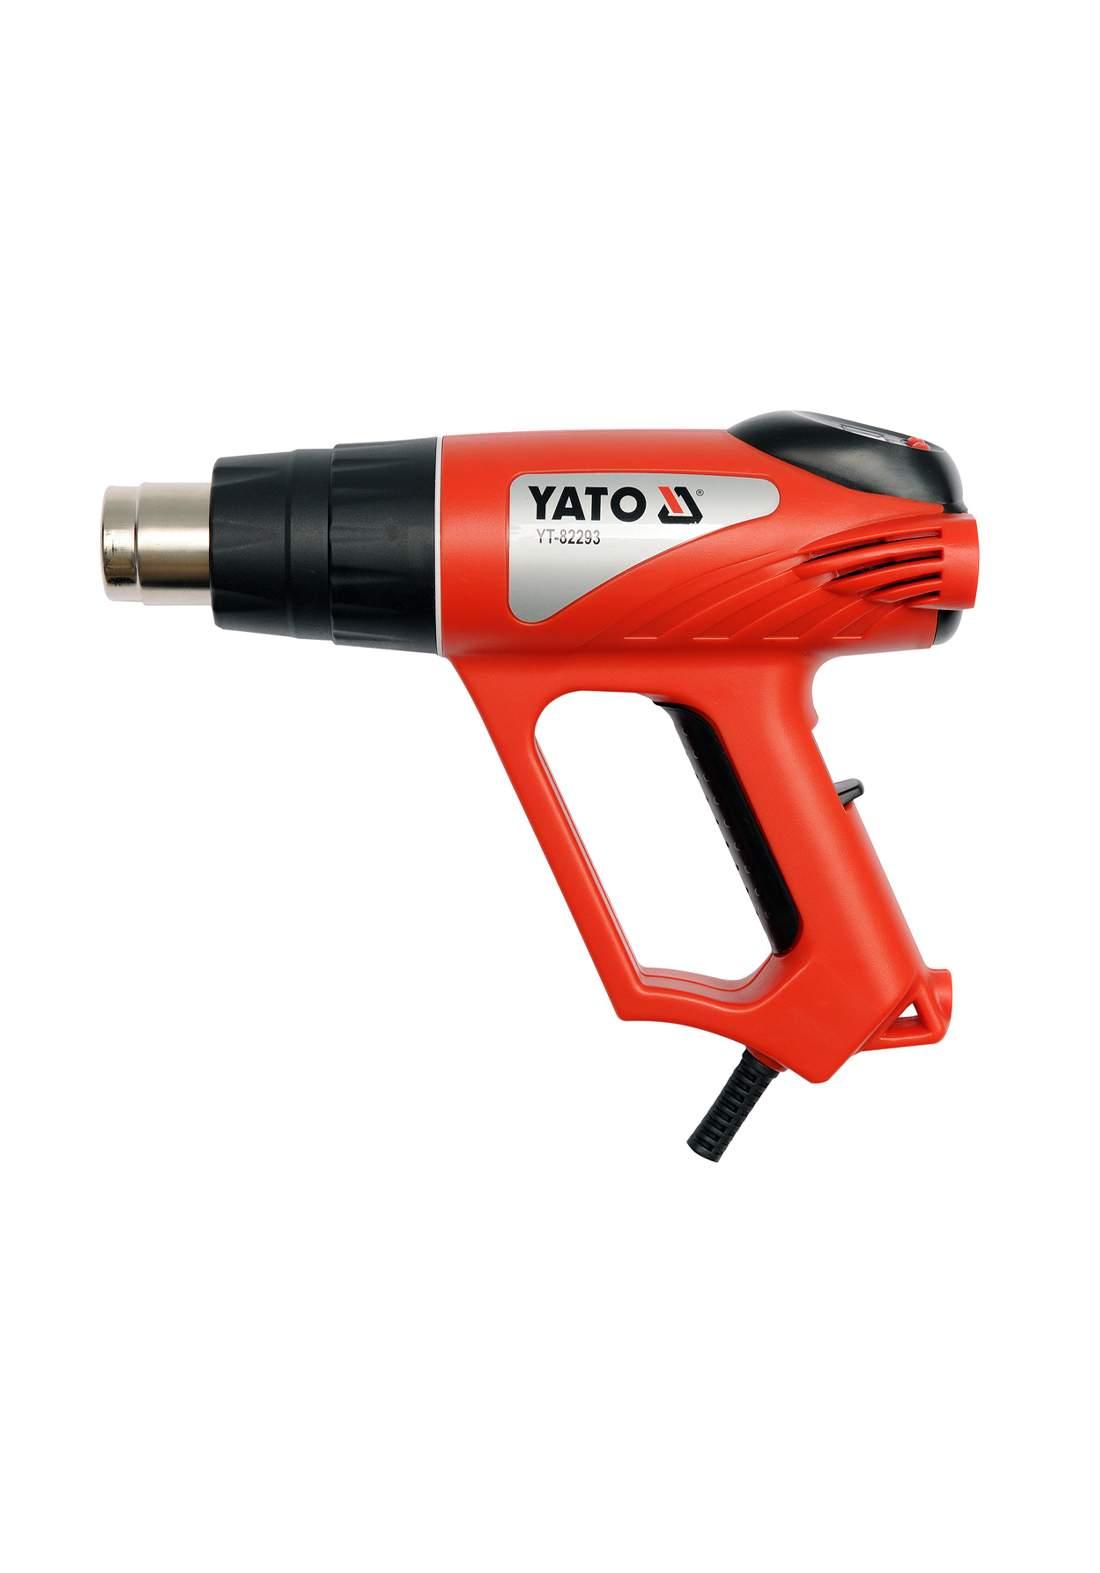 Yato Yt-82293 Heat gun 2000 W مسدس حراري